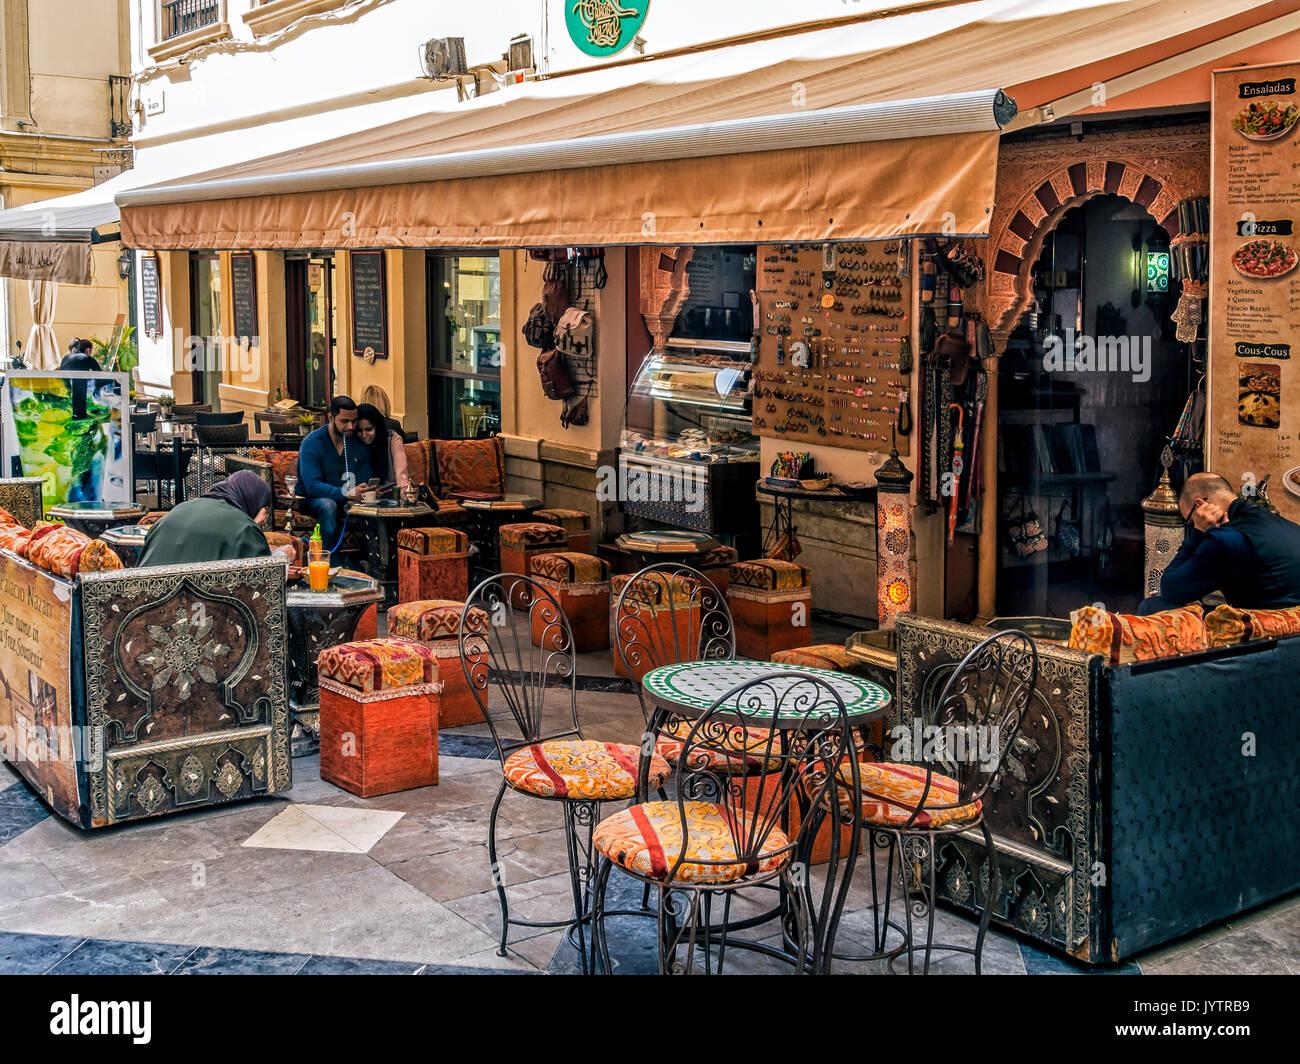 MALAGA,S PAIN:  Tourists at the pretty Pavement cafe Teteria Palacio Nazari Stock Photo